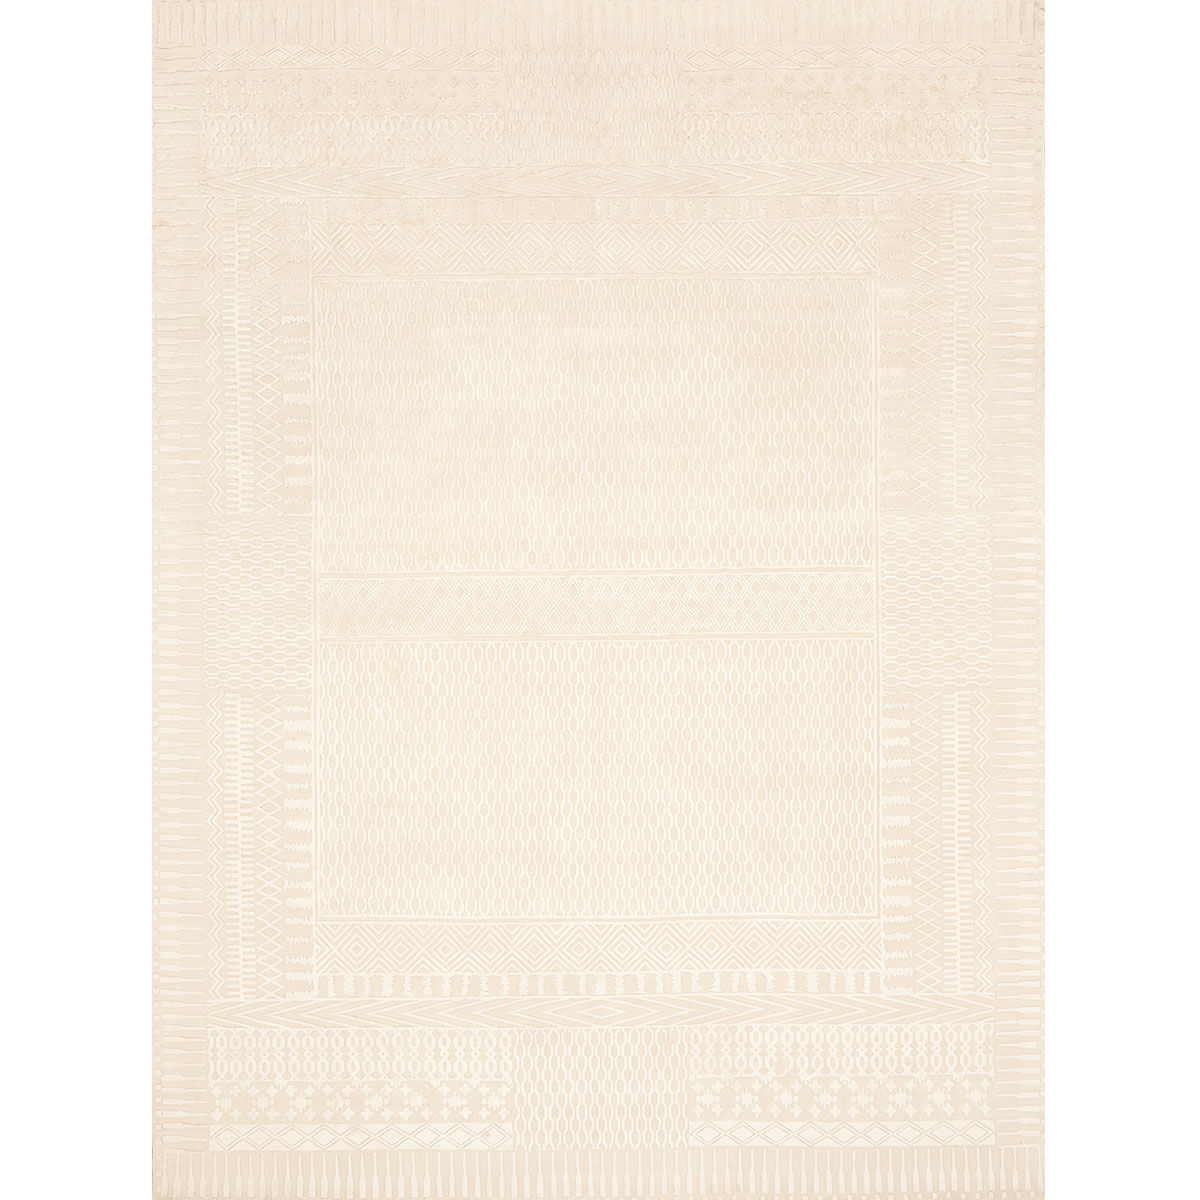 ventanas_wool-silk_hand-knotted_patterson-flynn-martin_pfm